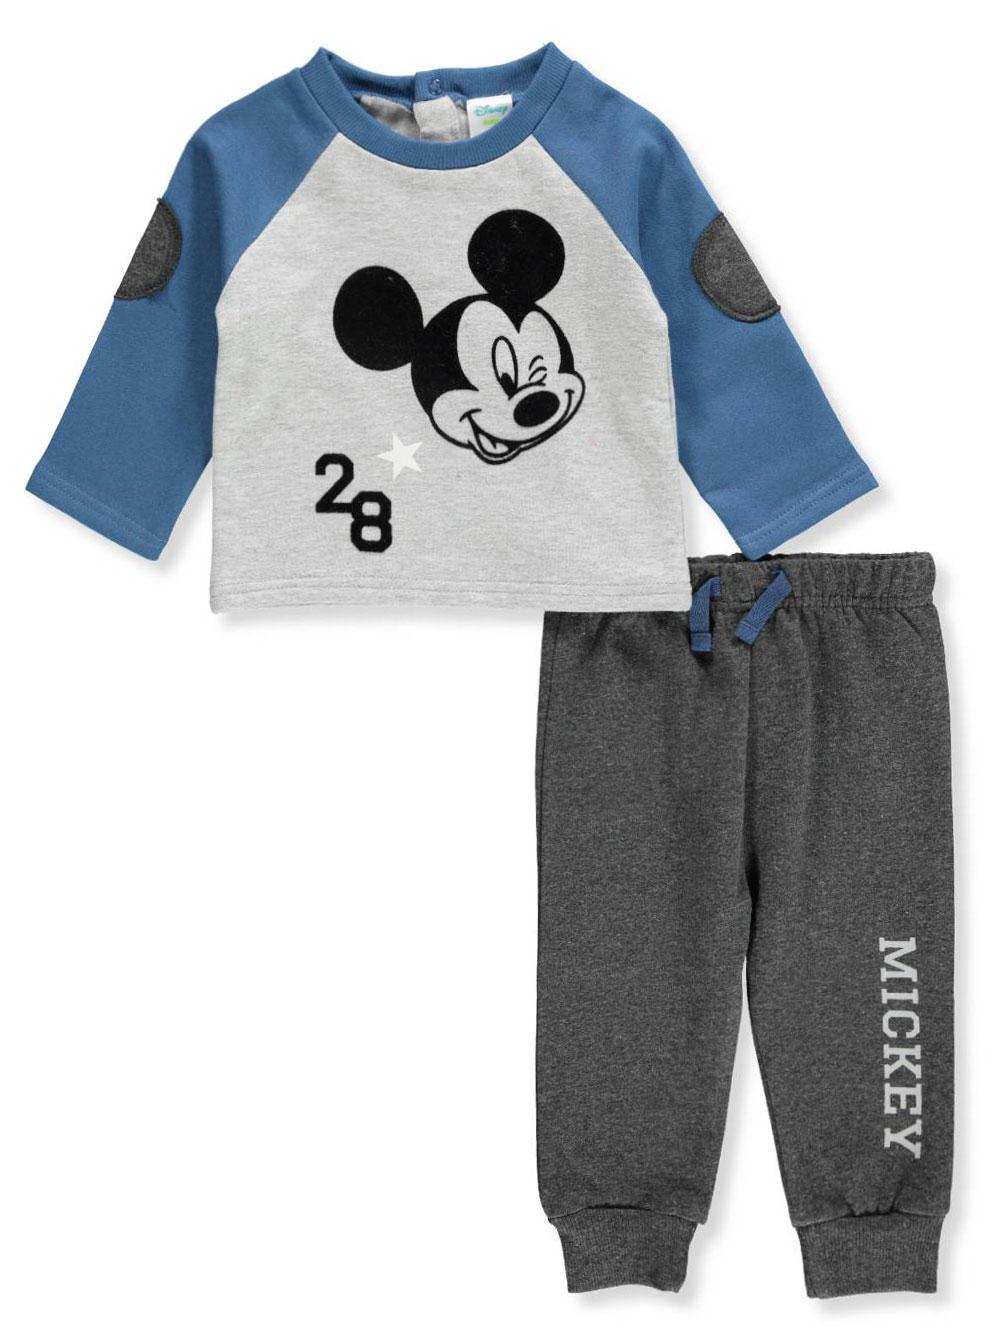 3b18d8e8a Disney Mickey Mouse Baby Boys' 2-Piece Pants Set Outfit | eBay